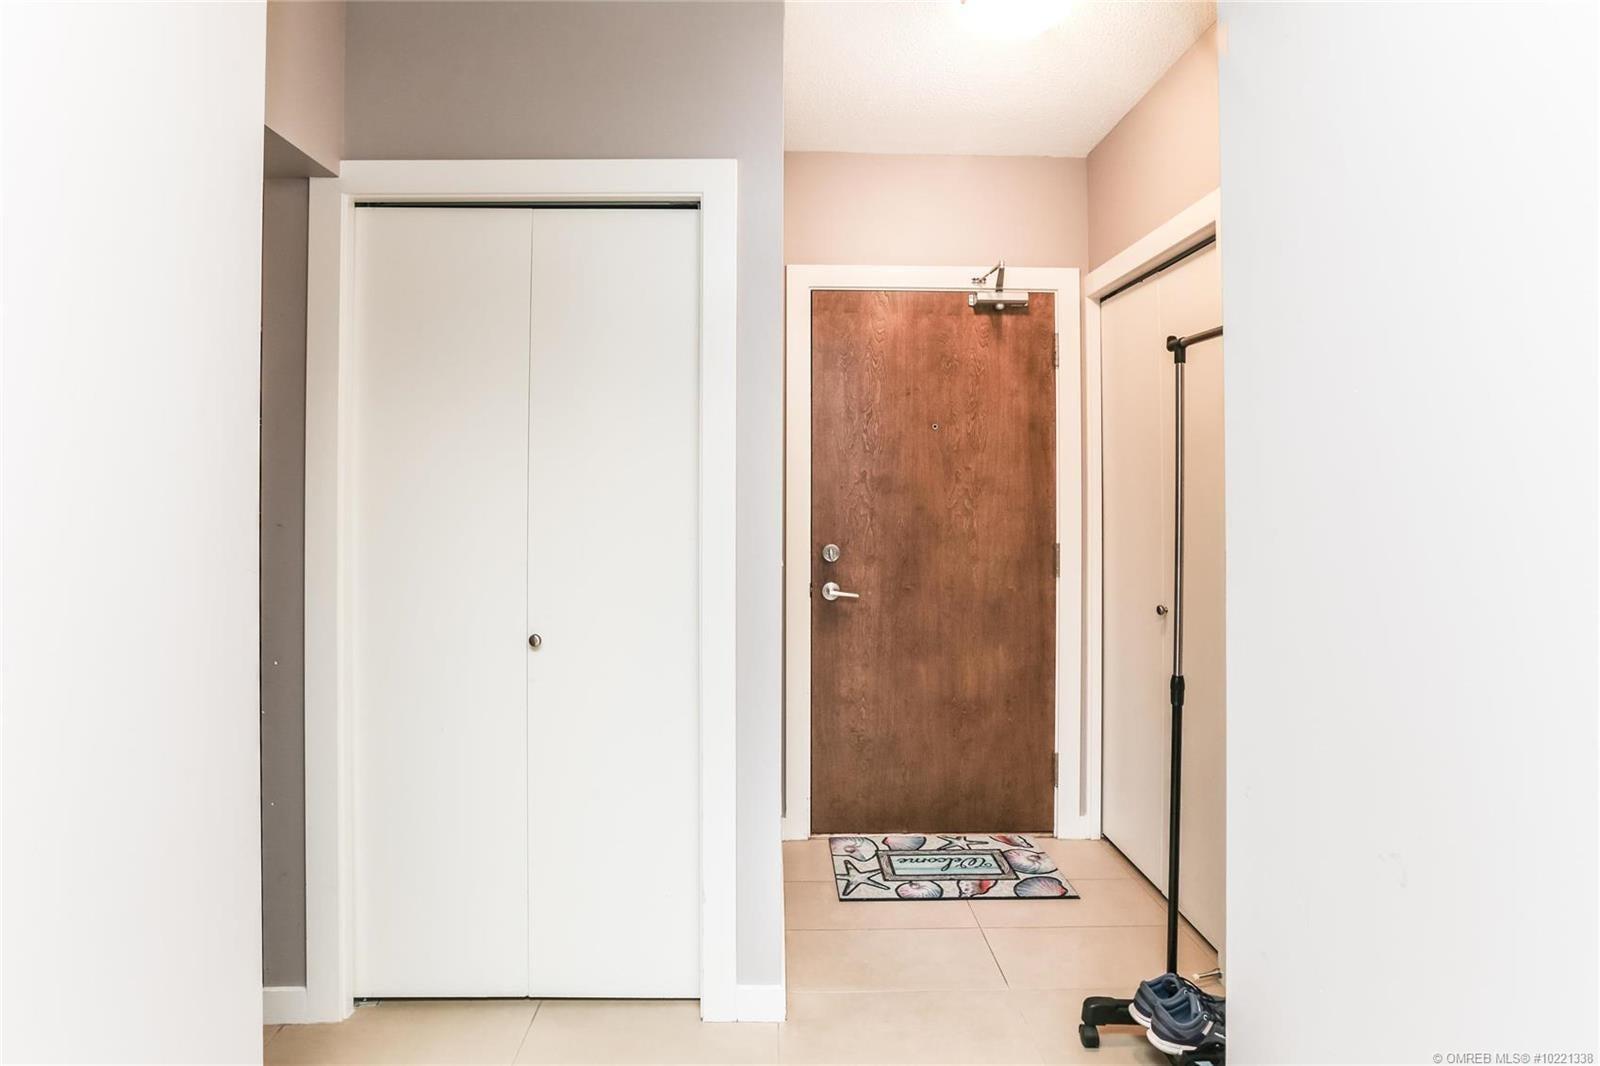 #404 1075 Sunset Drive, - Kelowna Apartment for sale, 1 Bedroom (10221338) - #3